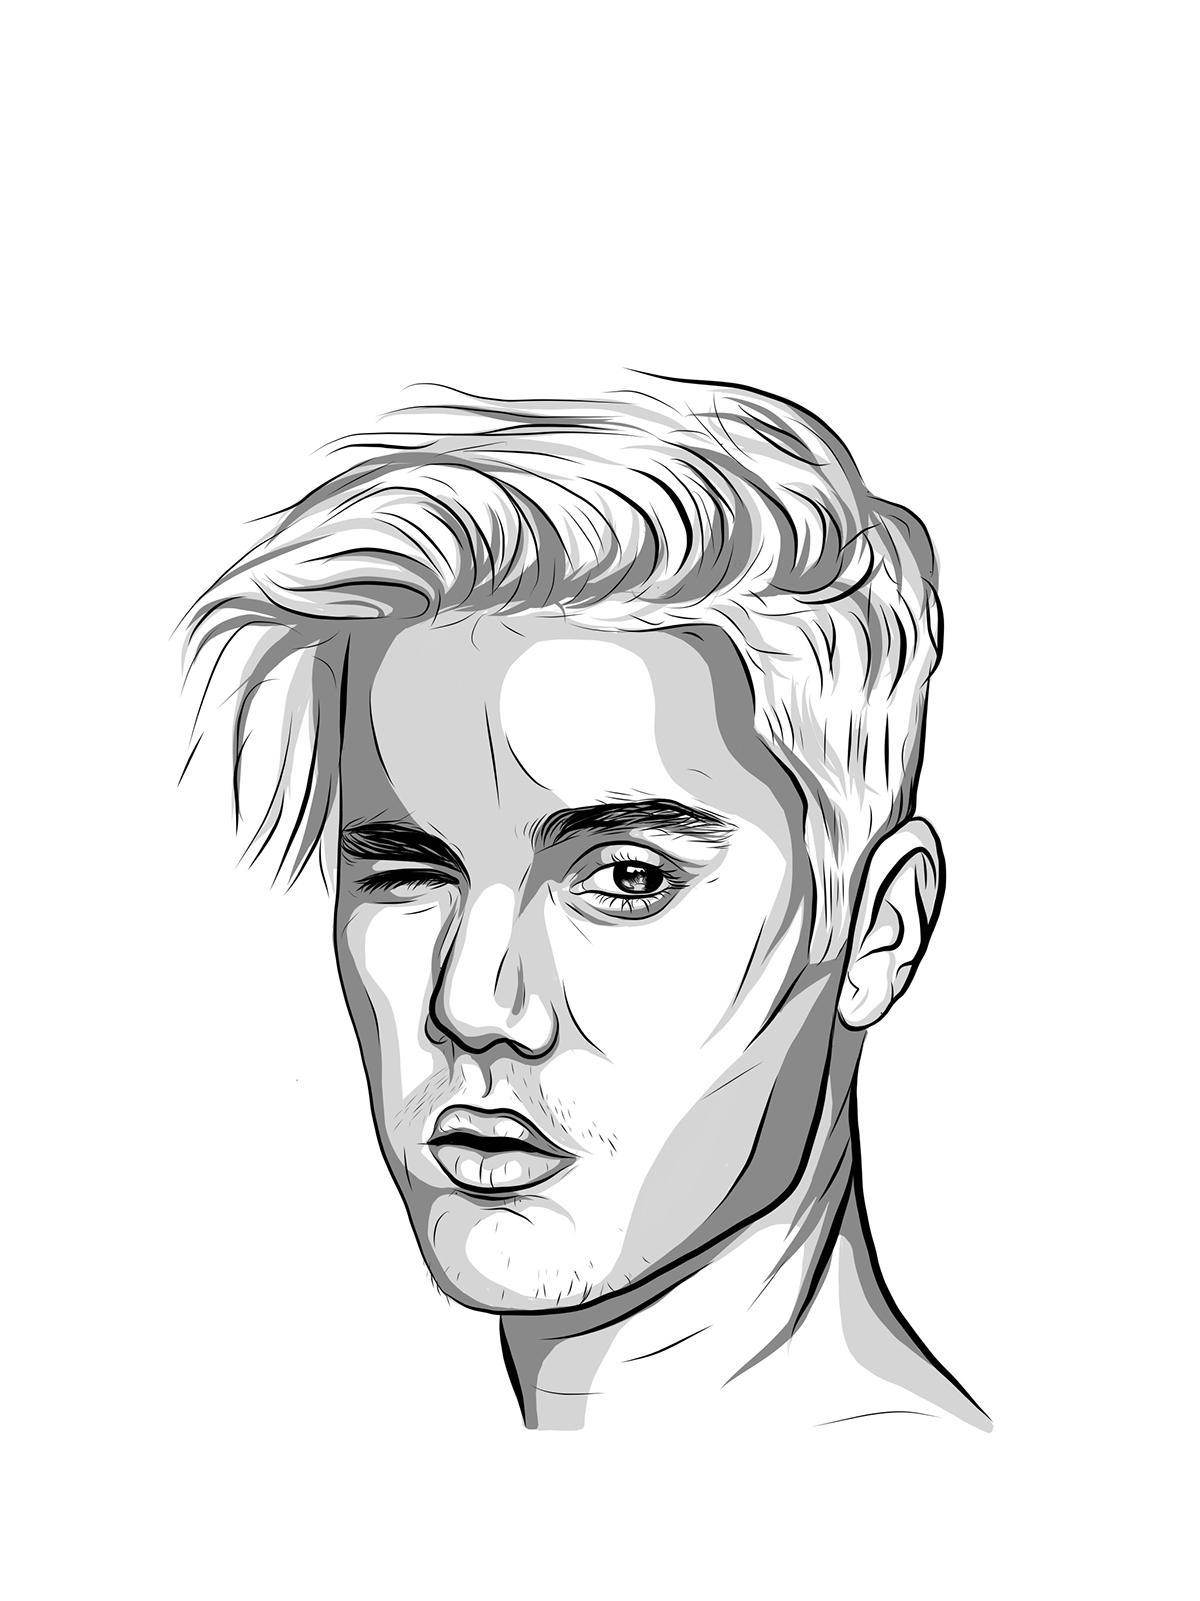 1200x1601 Justin Bieber Illustration On Behance